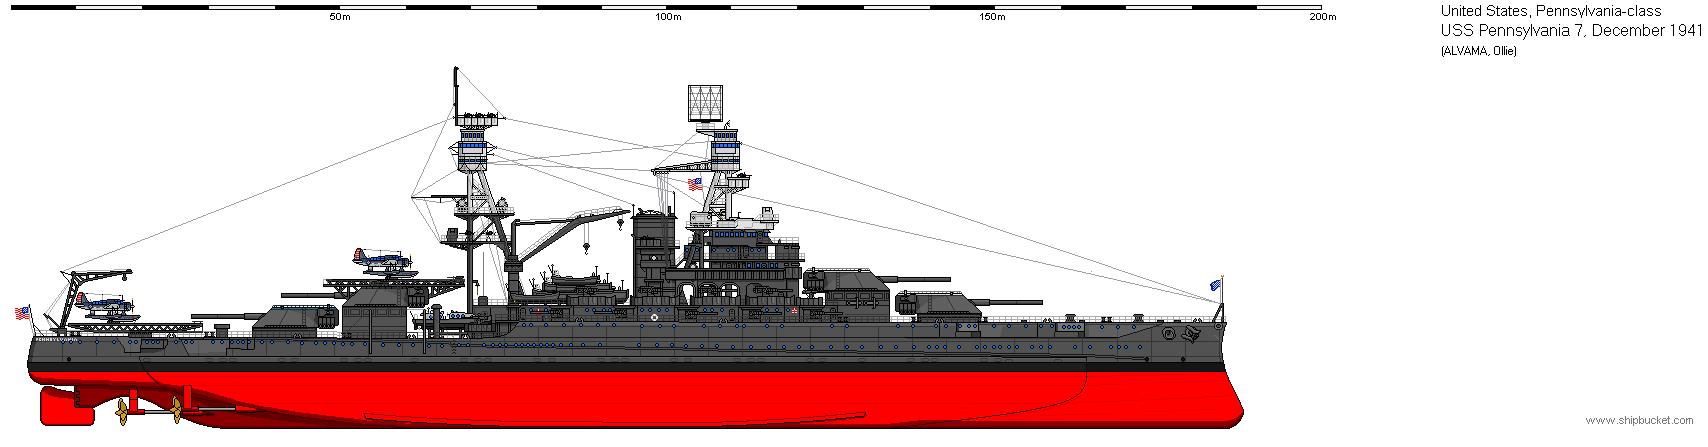 Military USS PENNSYLVANIA BB-38 Ship Polo Shirt